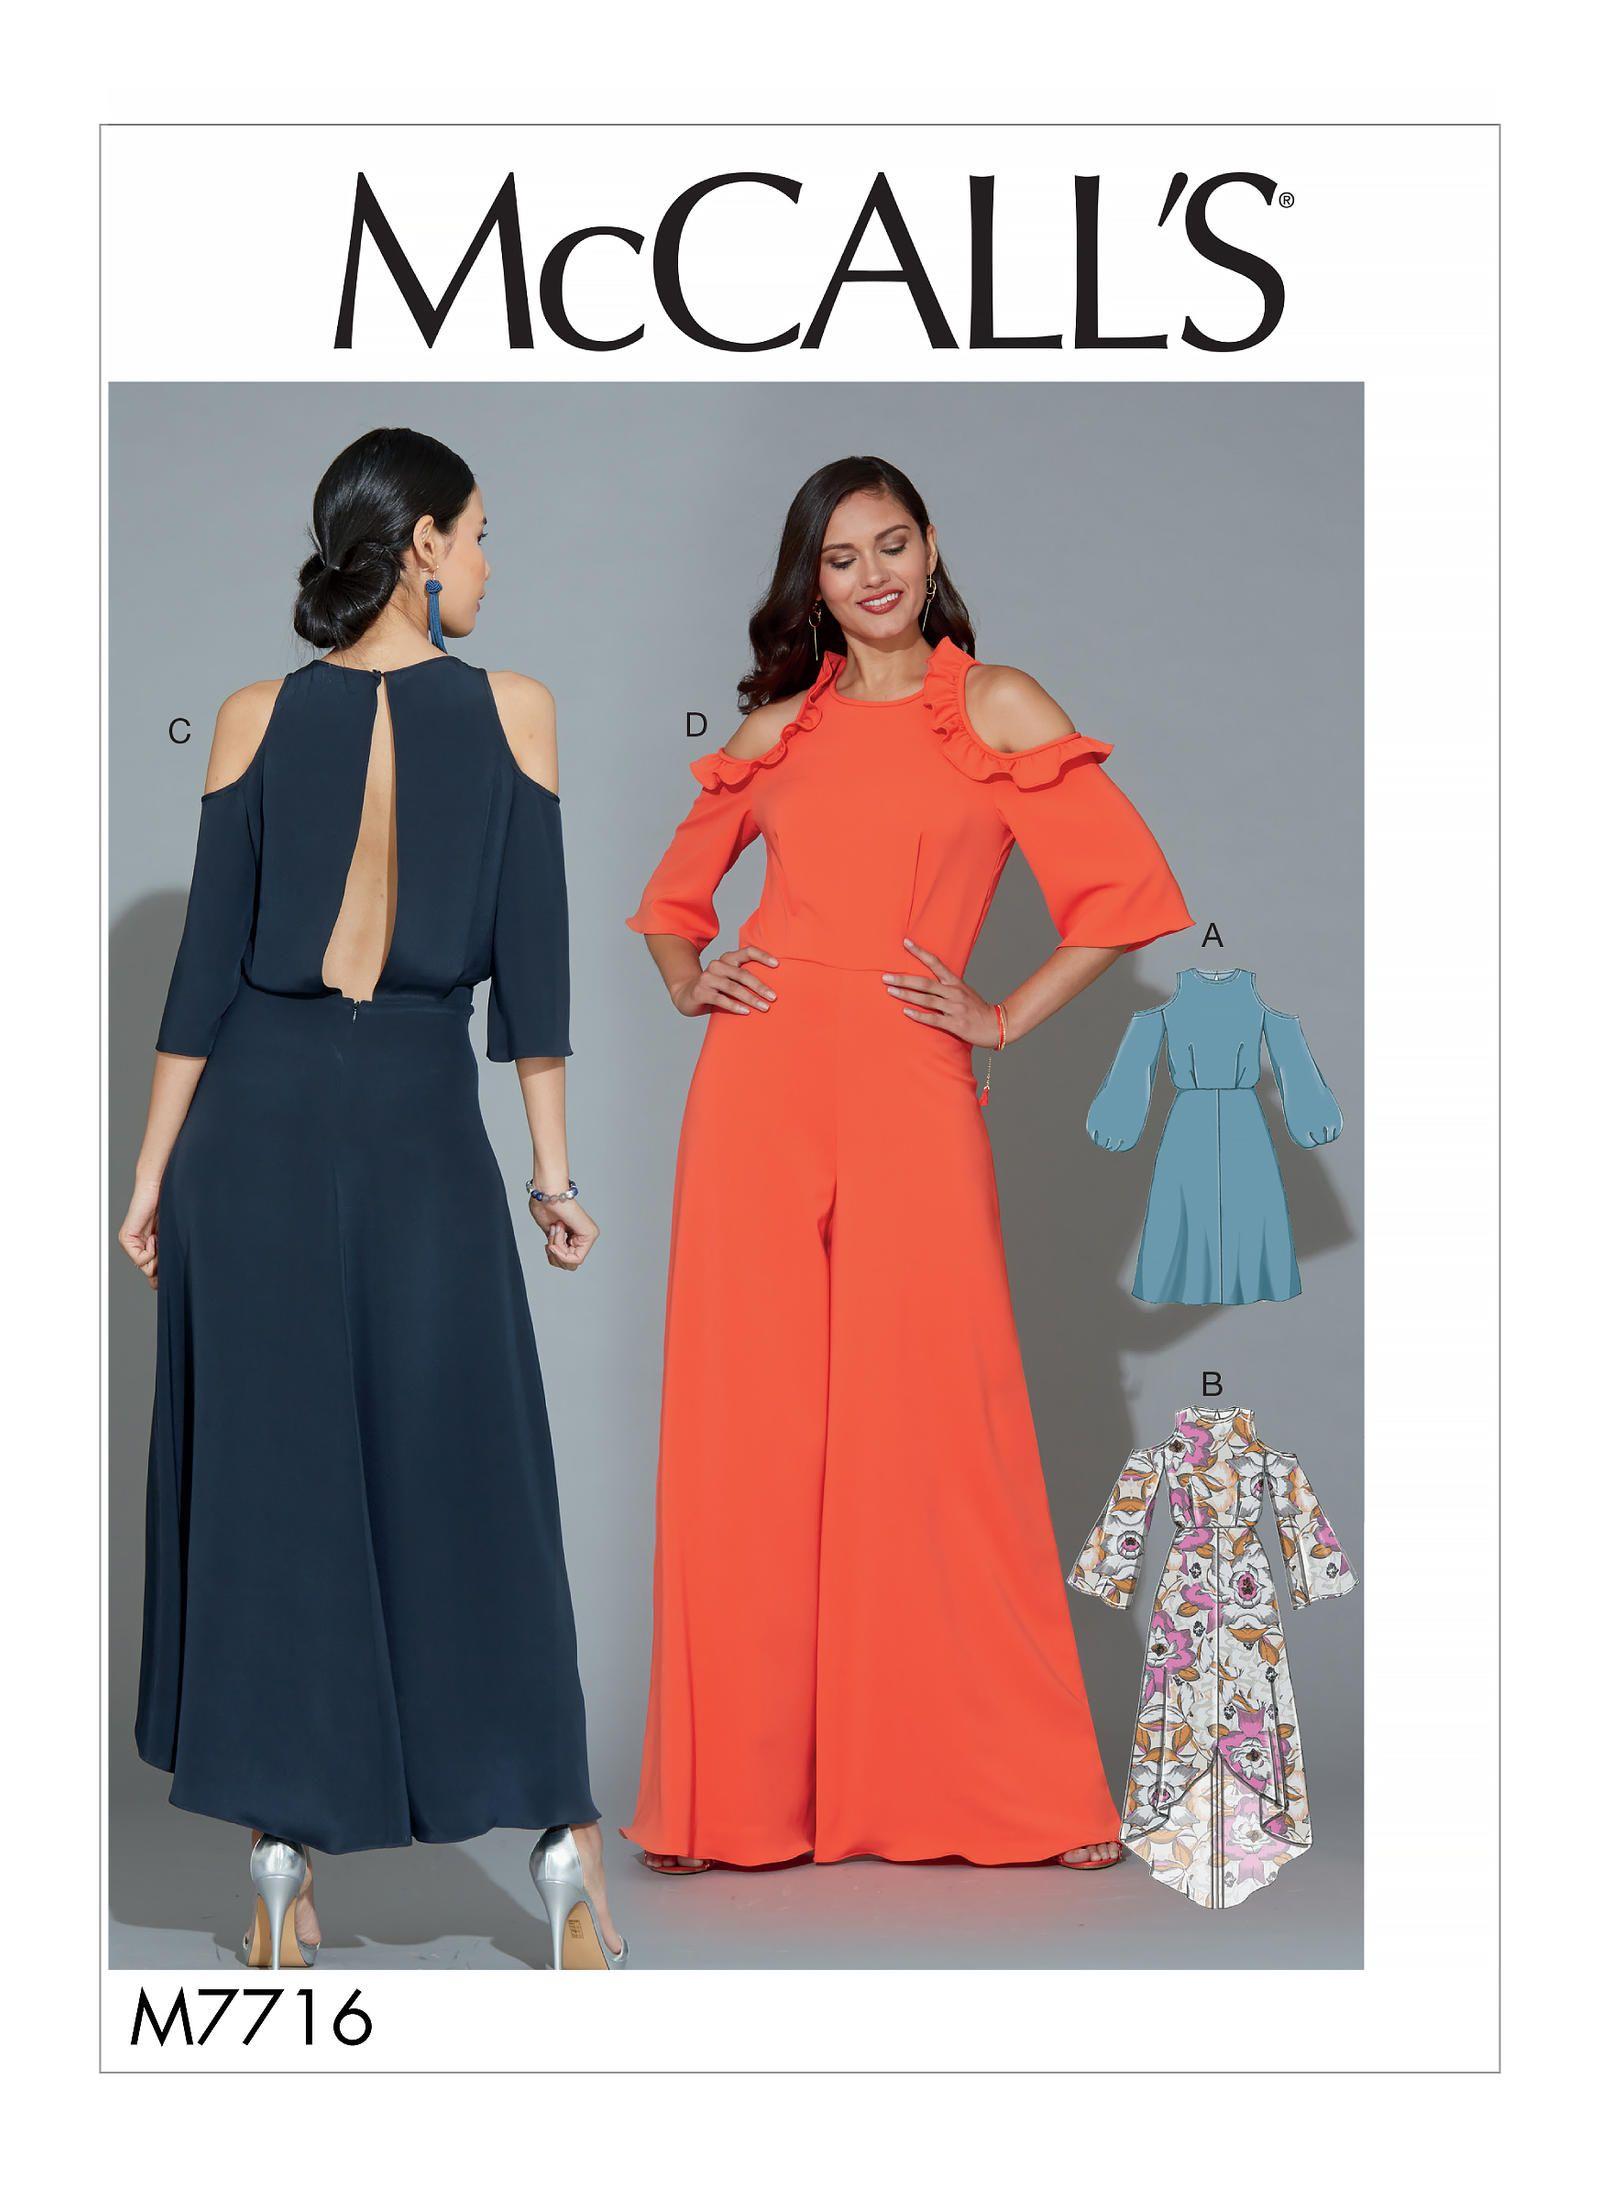 M7716 mccalls patterns sewing patterns patterns i have m7716 mccalls patterns sewing patterns jeuxipadfo Choice Image